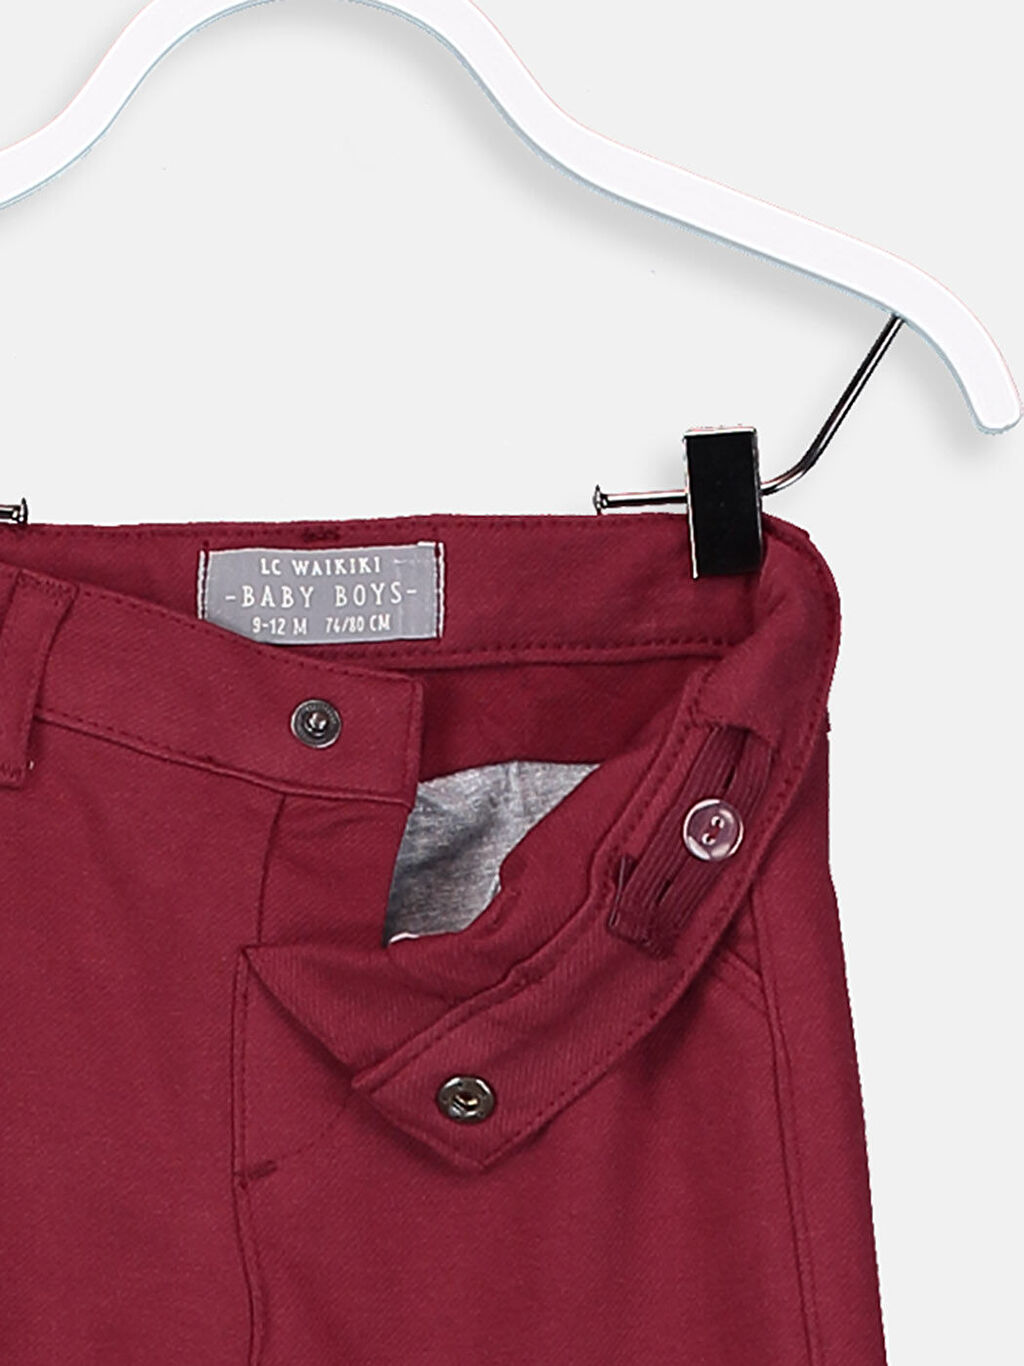 %74 Pamuk %19 Polyester %7 Elastan Erkek Bebek Pamuklu Pantolon